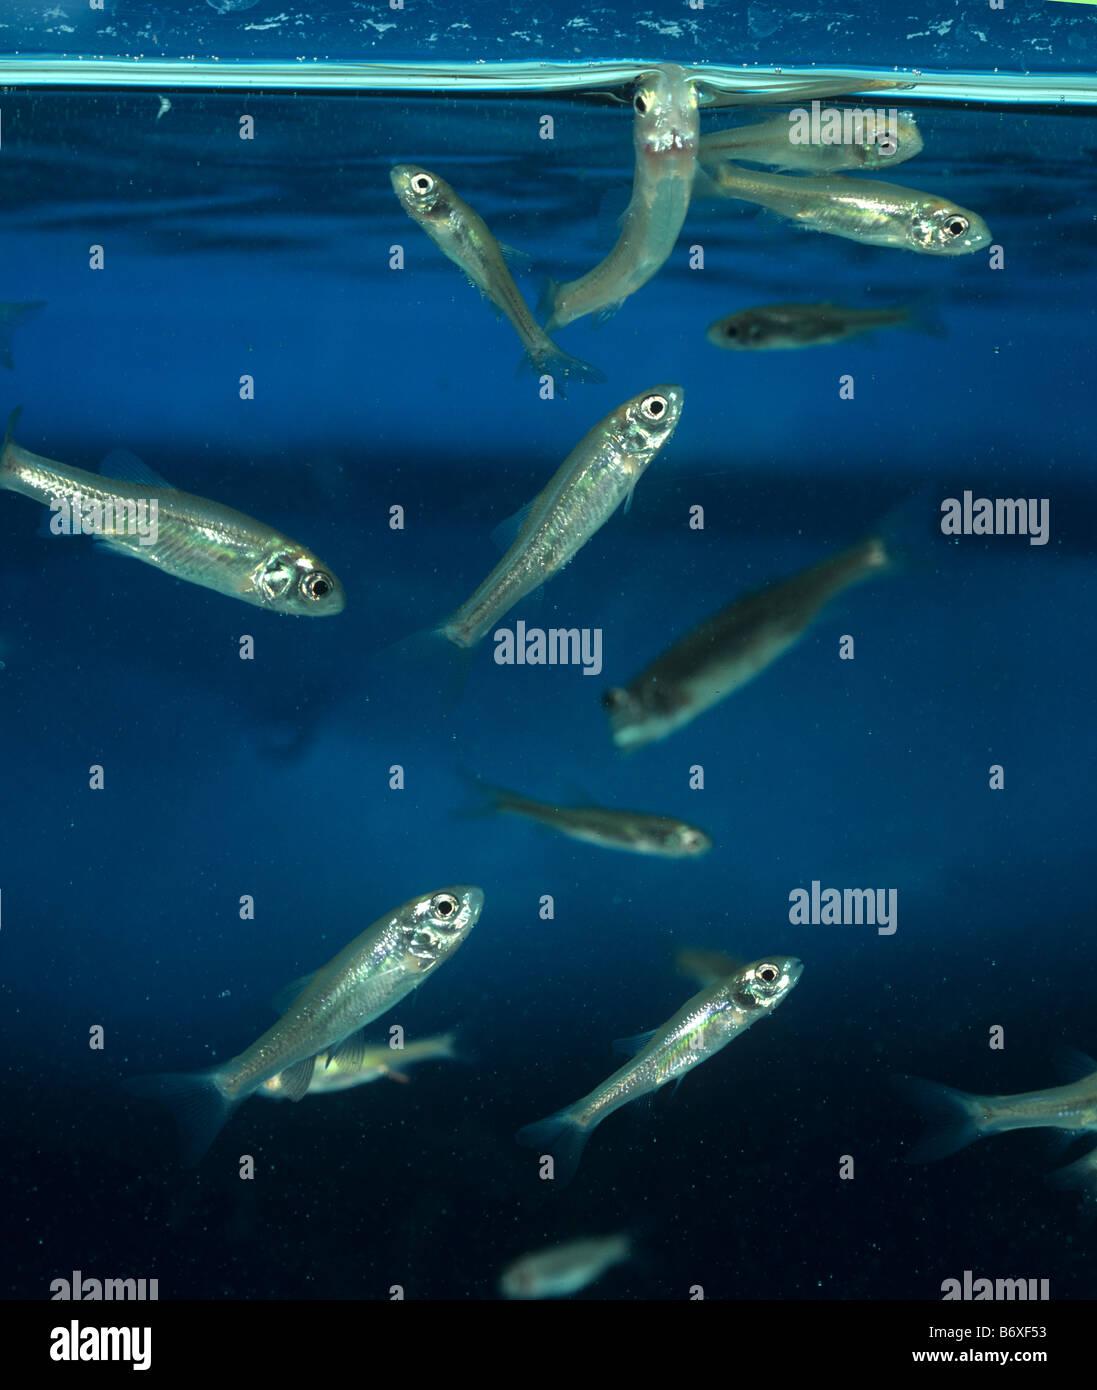 Minnows Stock Photos & Minnows Stock Images - Alamy